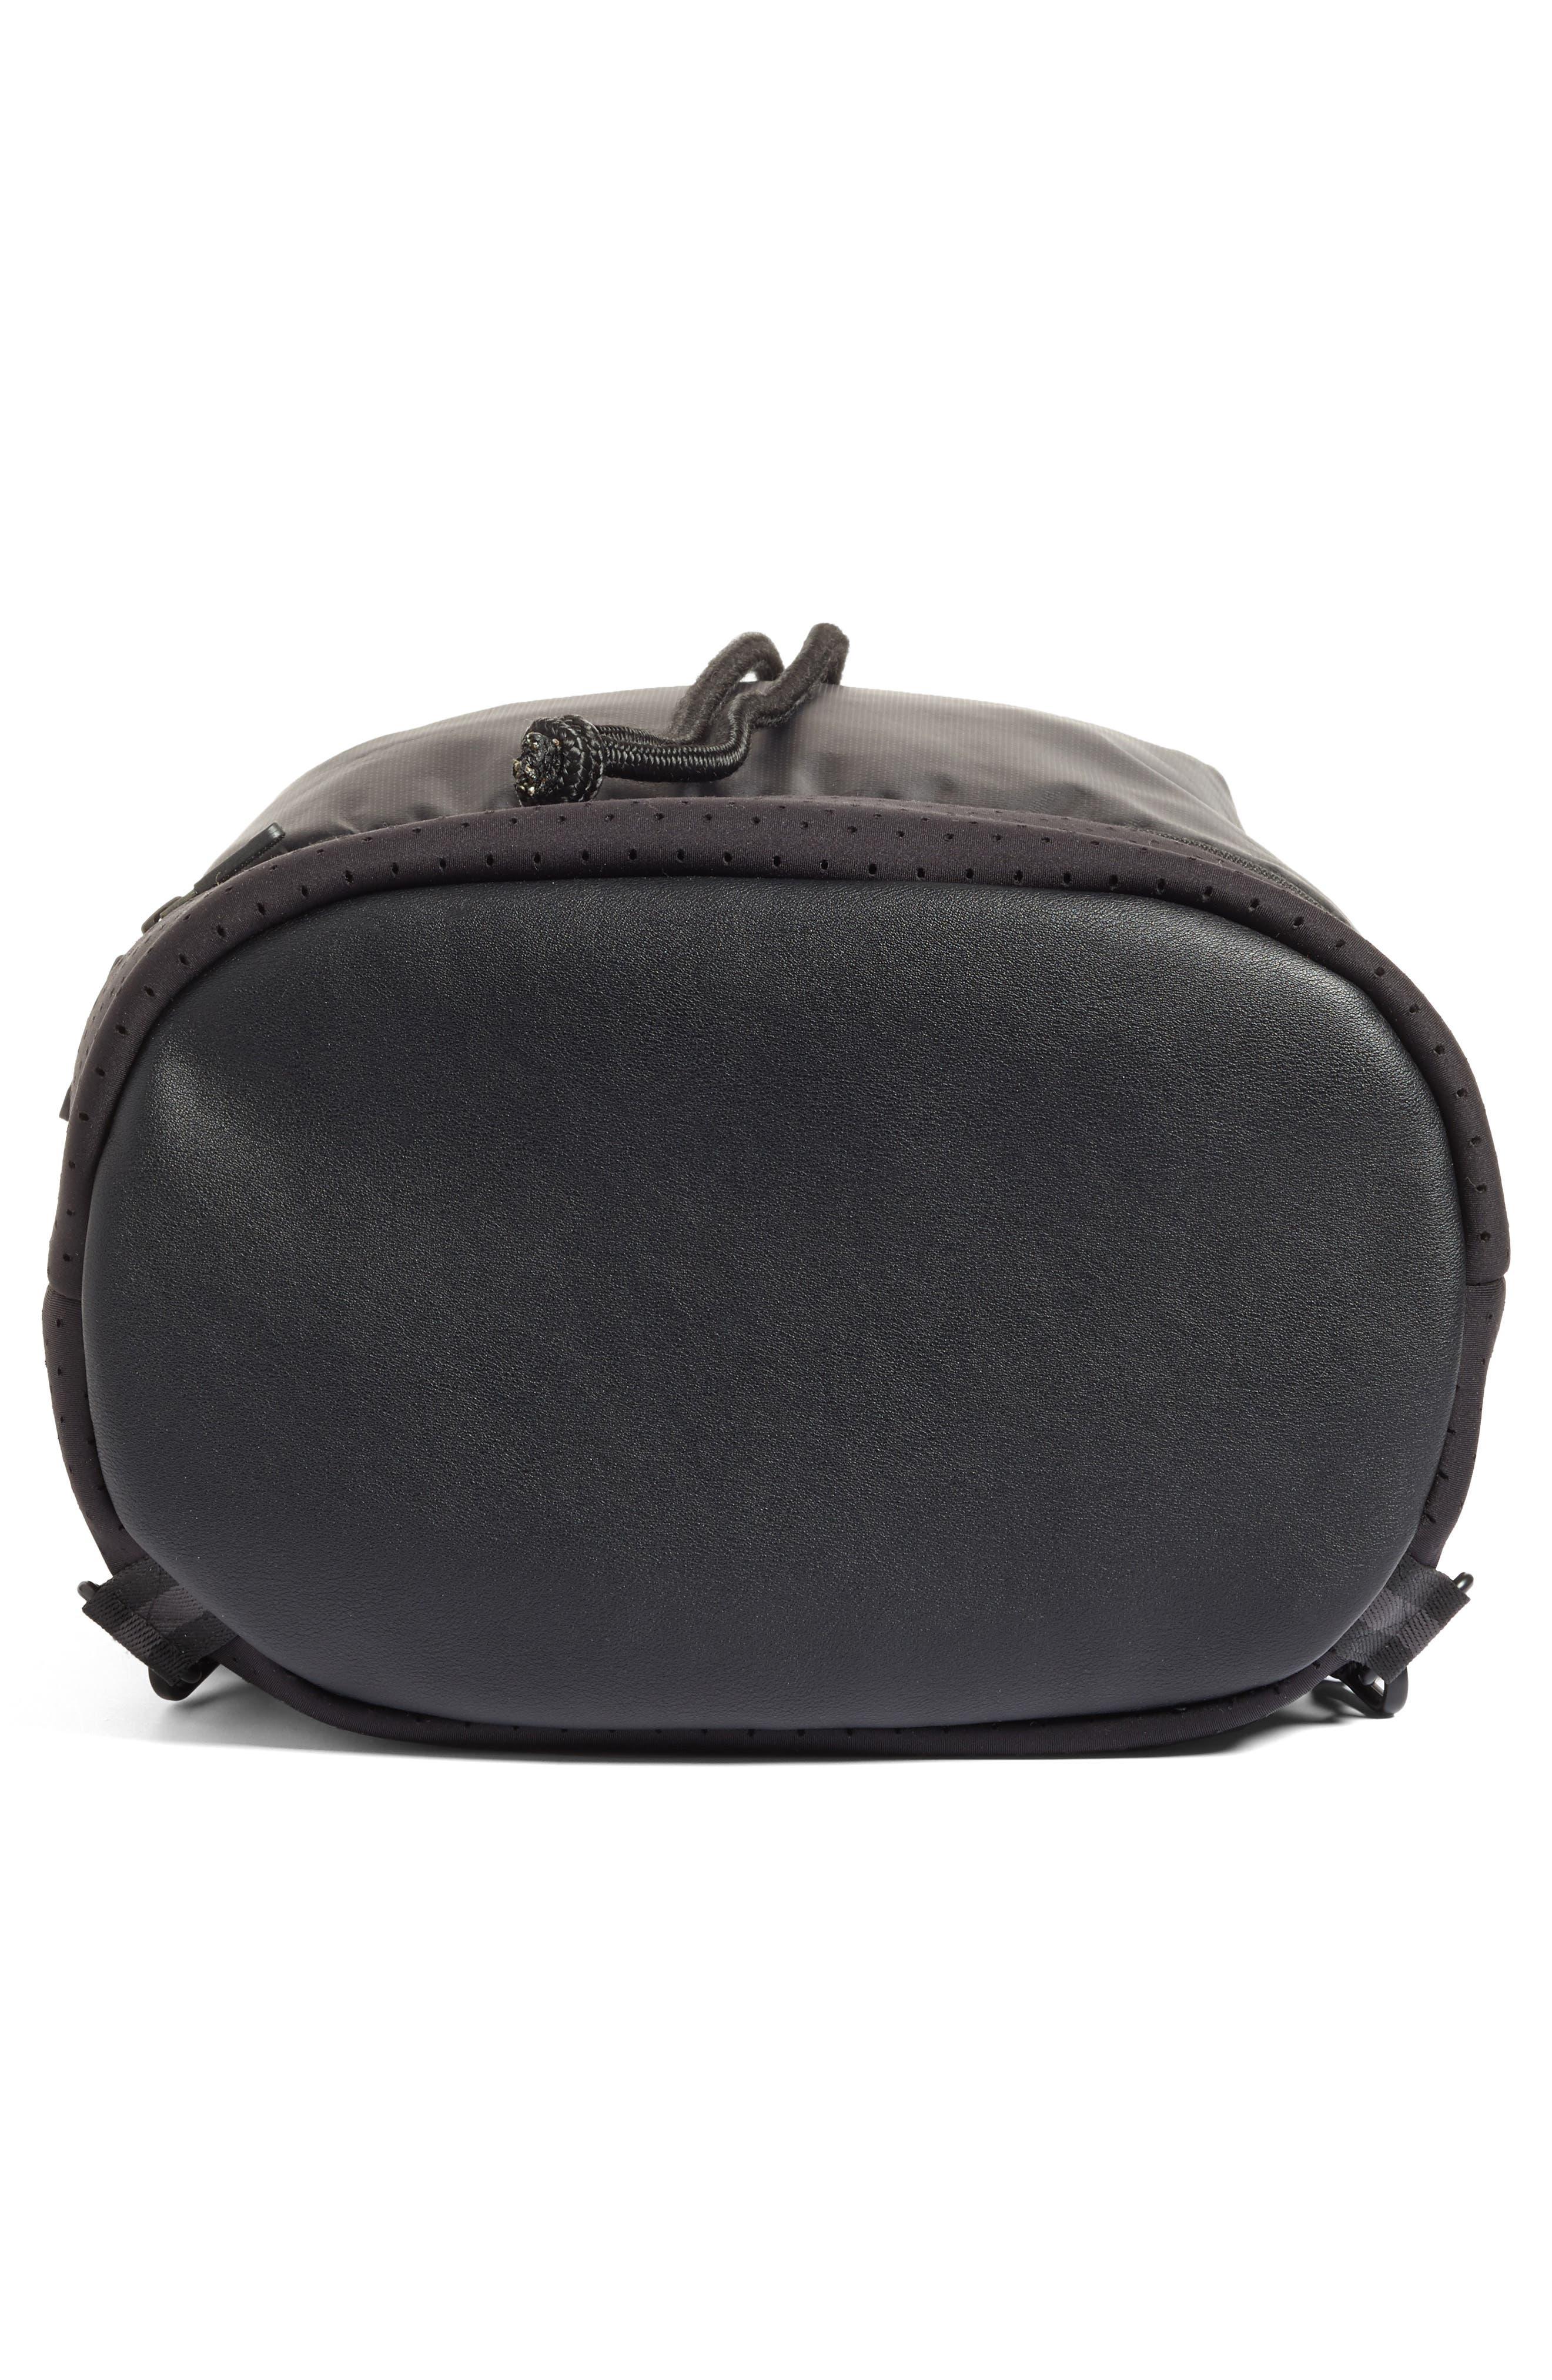 ZELLA,                             Convertible Backpack,                             Alternate thumbnail 6, color,                             002